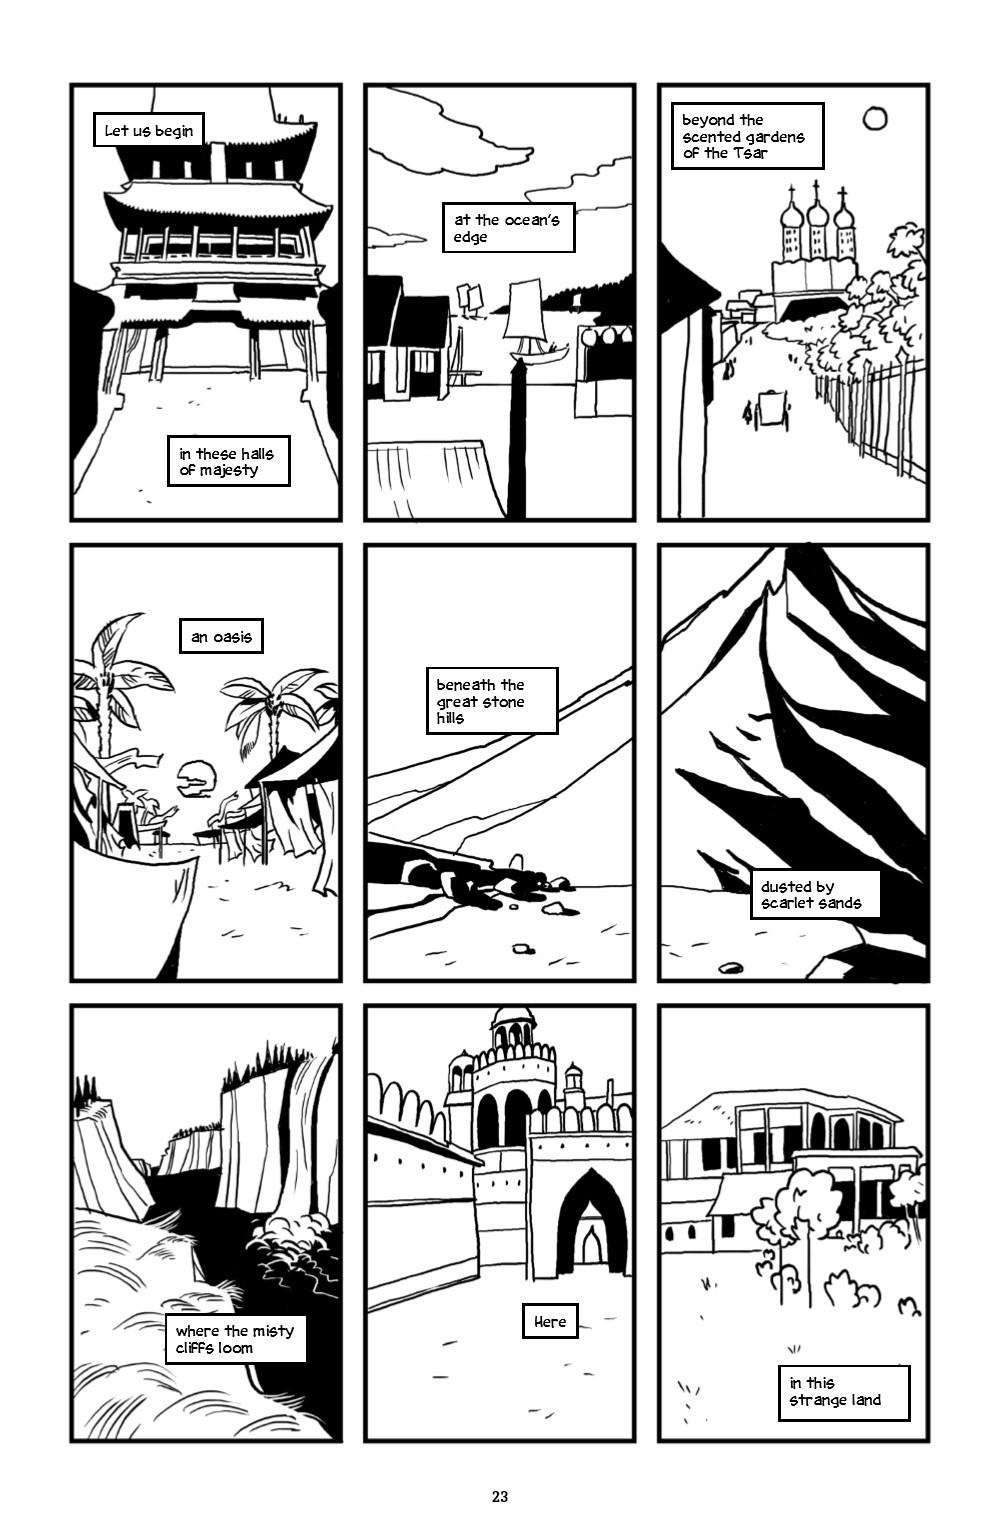 ONELINE-HC-MARKETING-024 ComicList Previews: ONE LINE HC